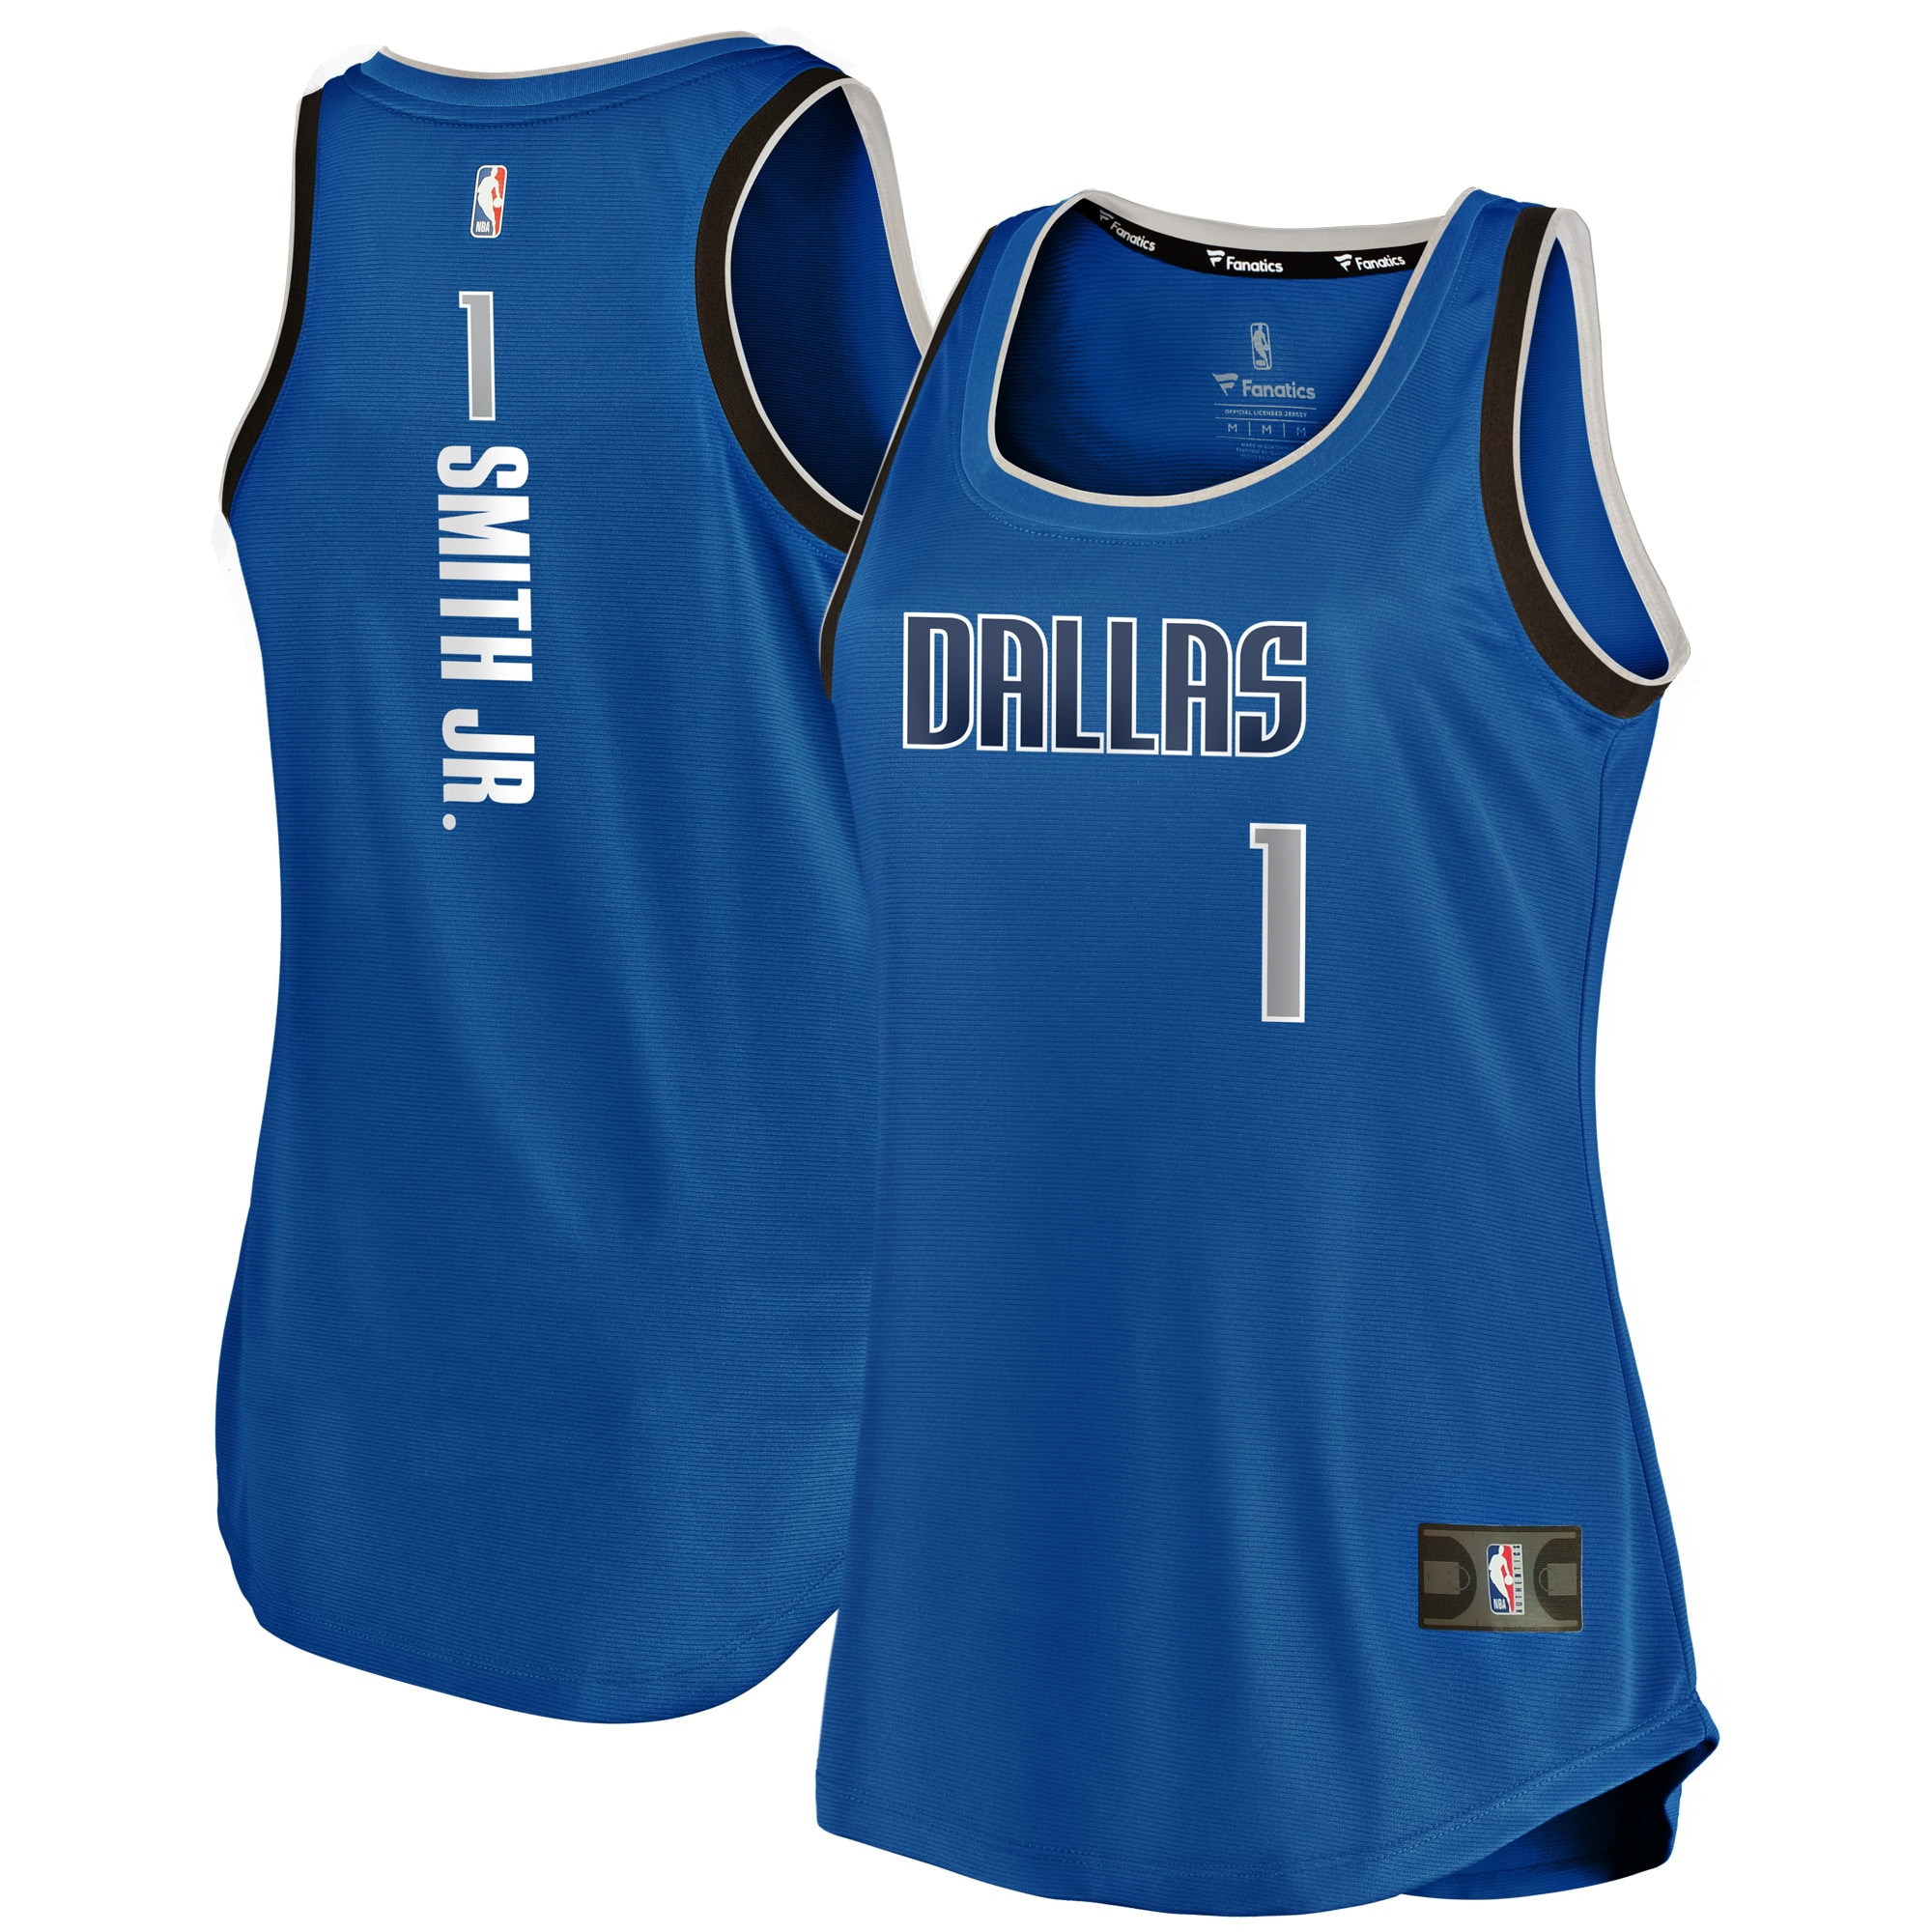 Dennis Smith Jr Dallas Mavericks Fanatics Branded Women's Fast Break Tank Jersey - Icon Edition - Royal